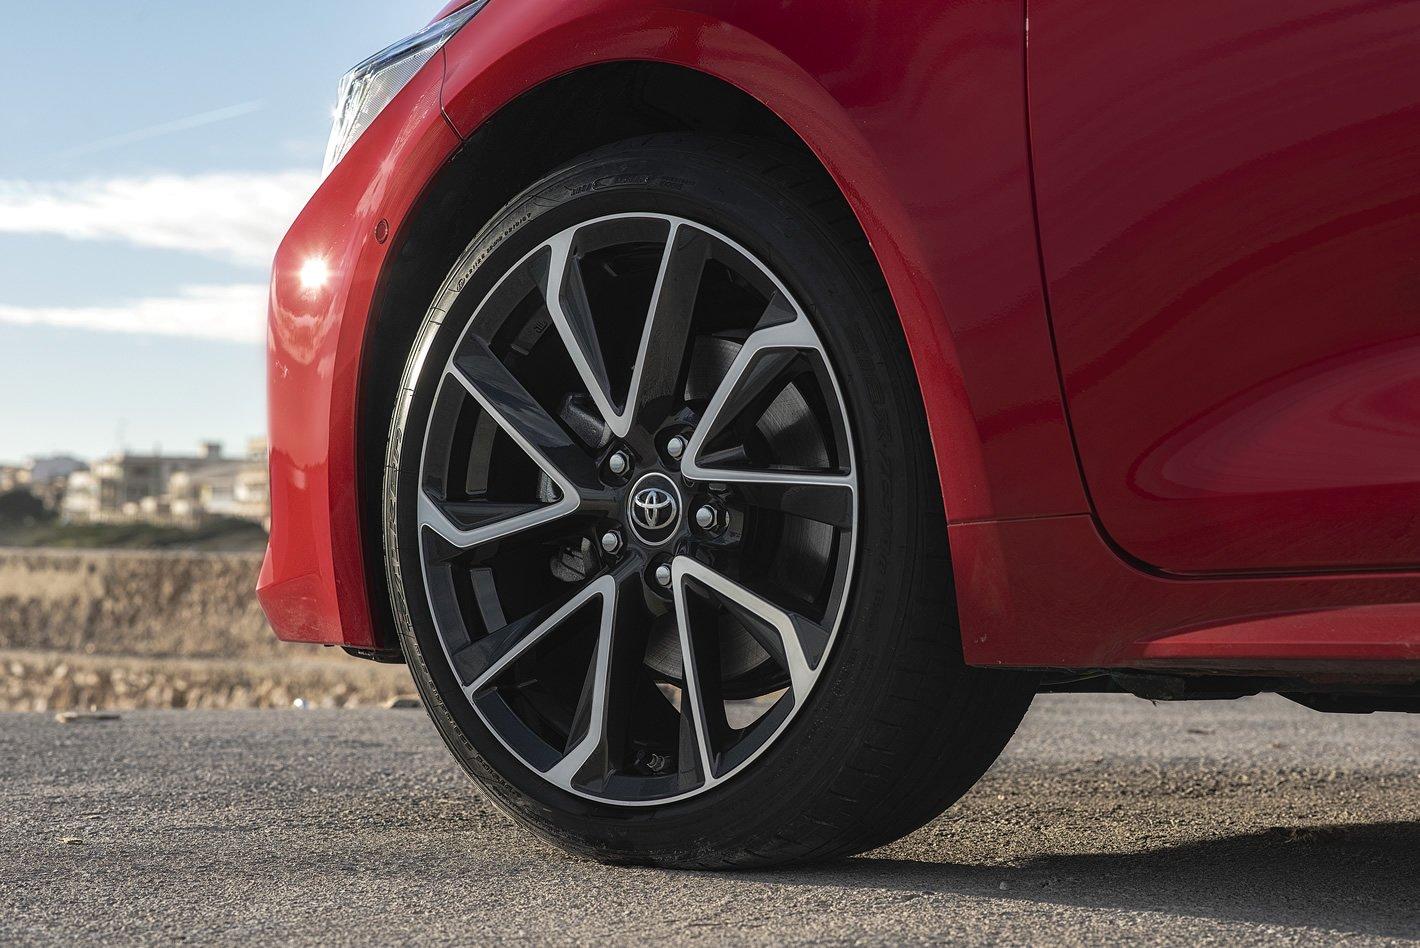 Toyota Corolla 2019 - felga i opona wersji 2.0 l Hybrid